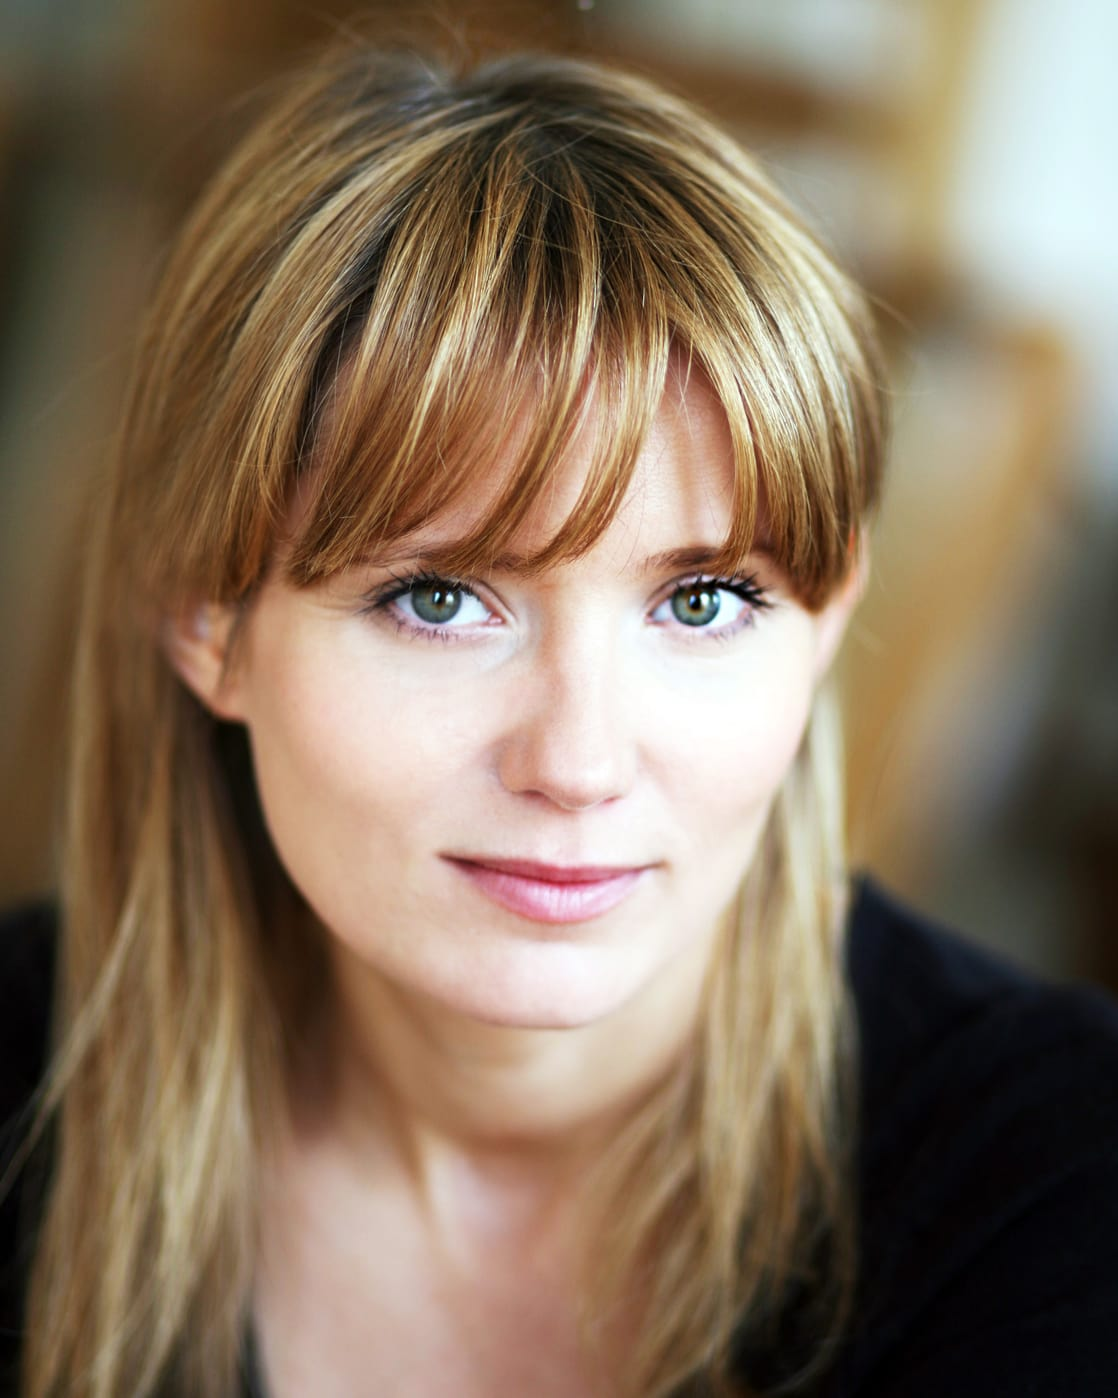 Dannielle Brent (born 1979)